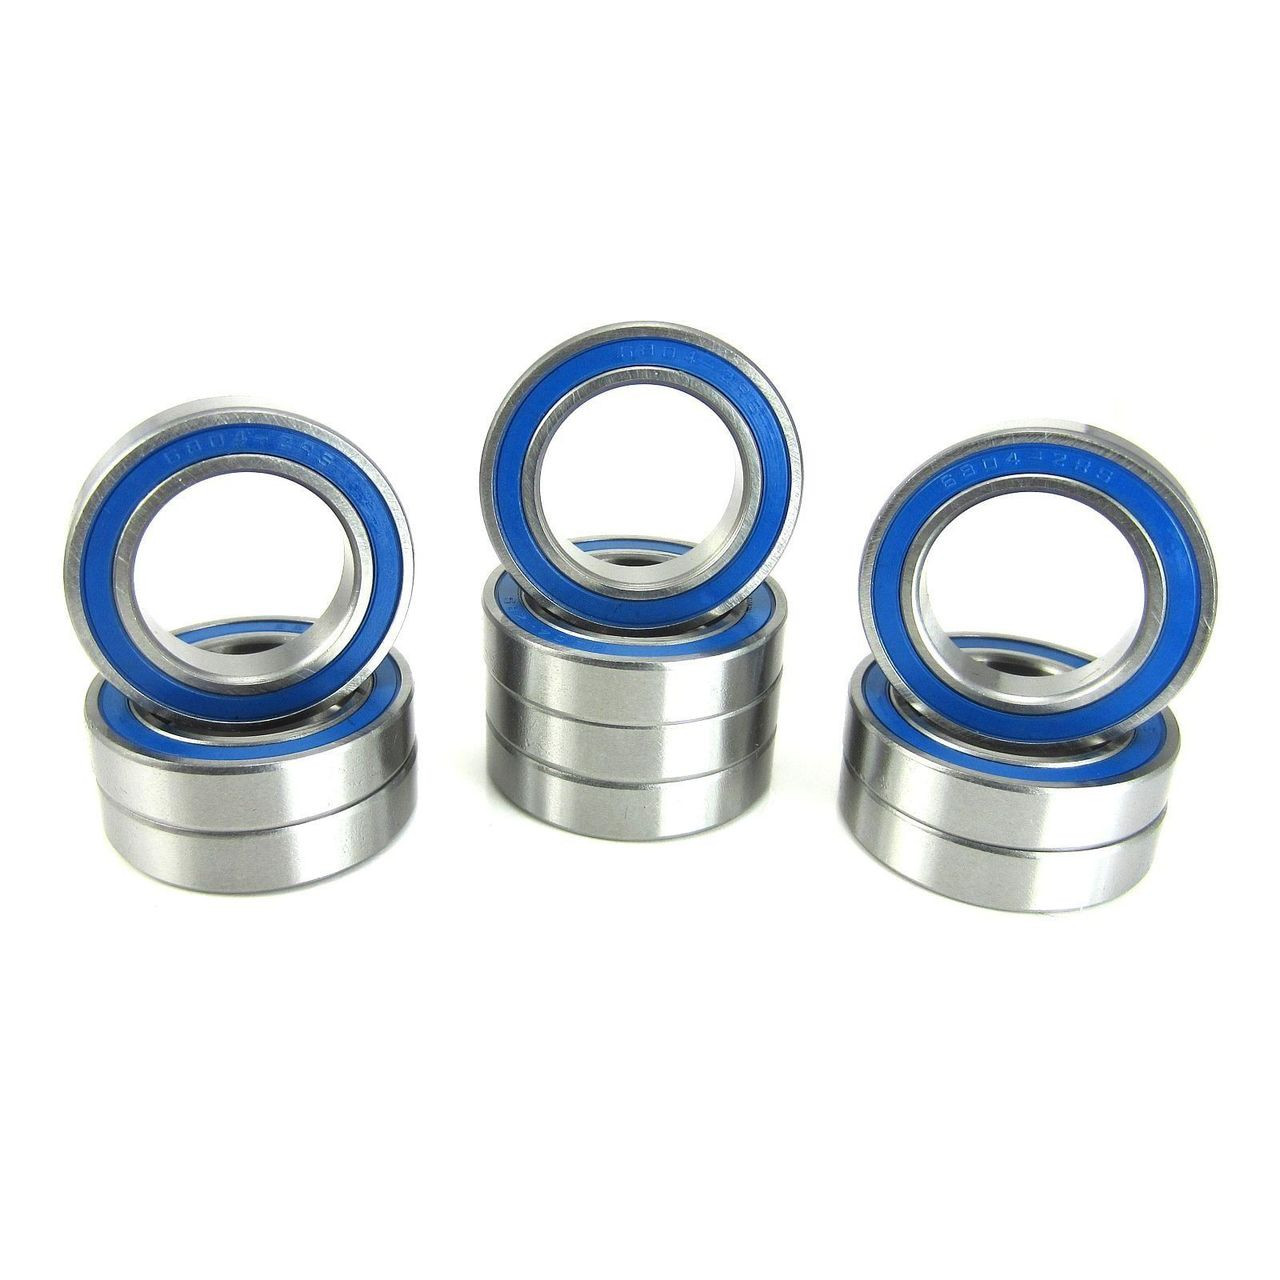 TRB RC 20x32x7mm Precision Ball Bearings ABEC 3 BLU Rubber Seals (10)